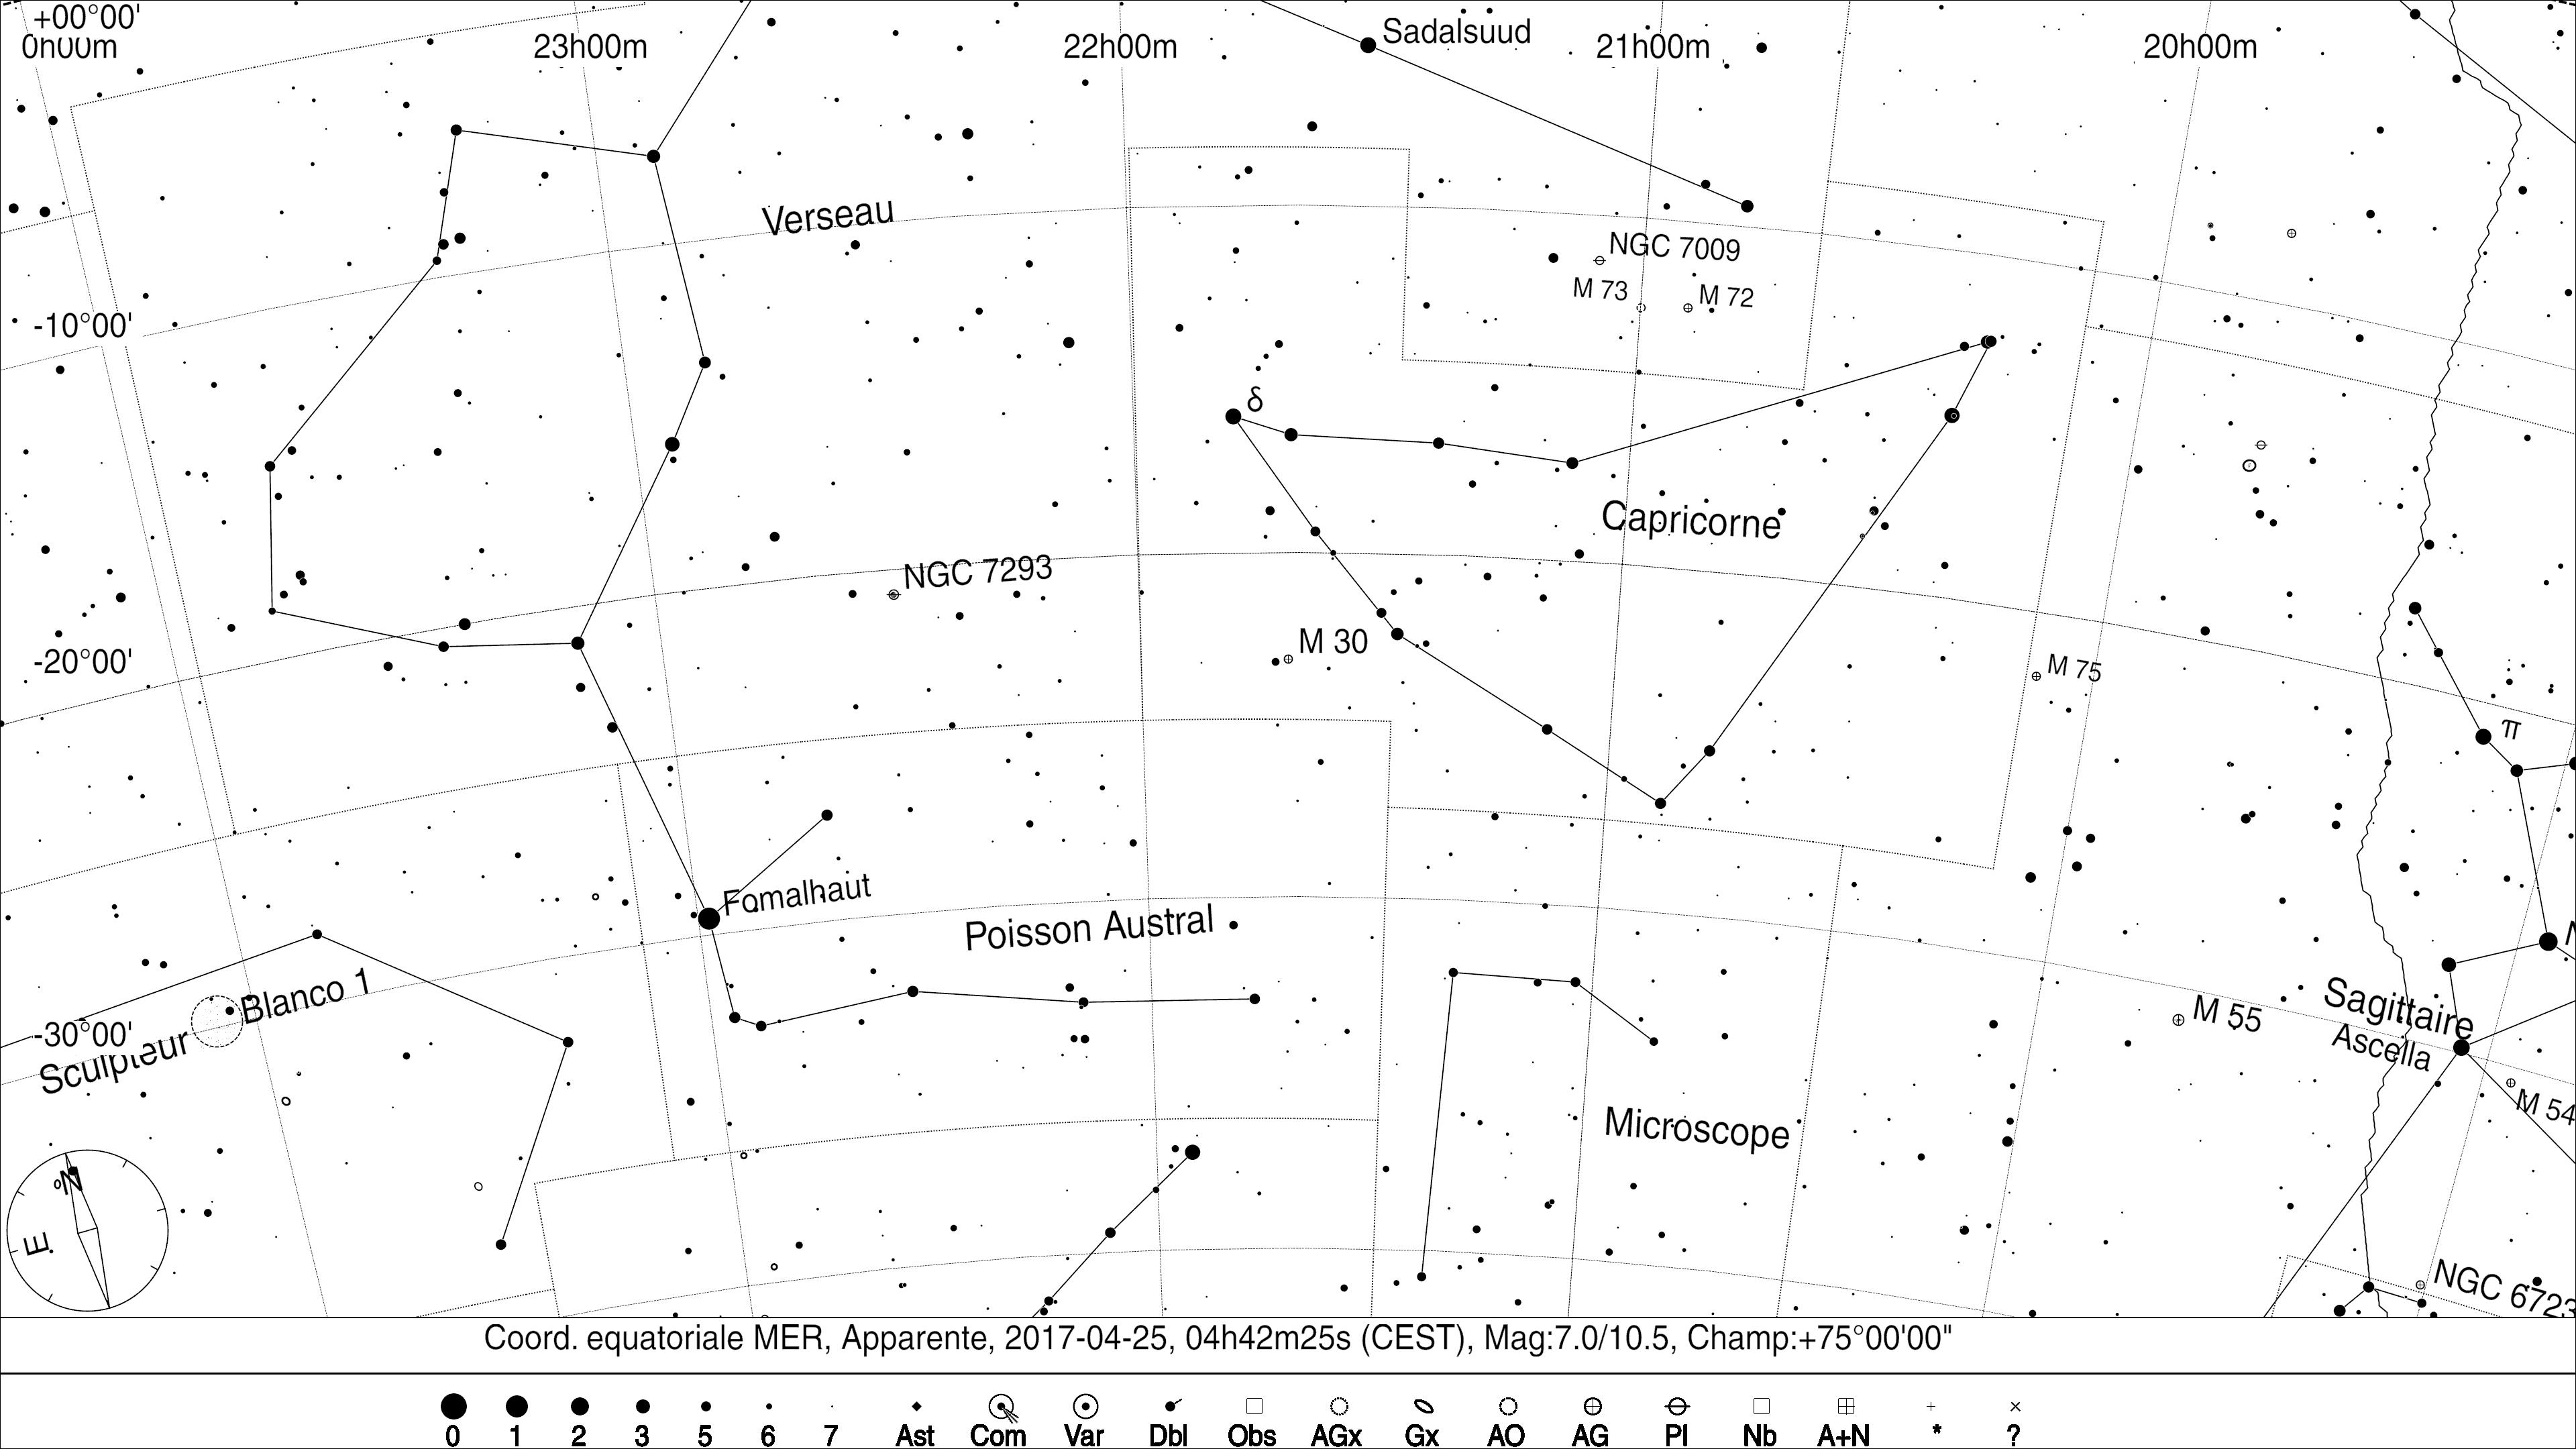 M30_75